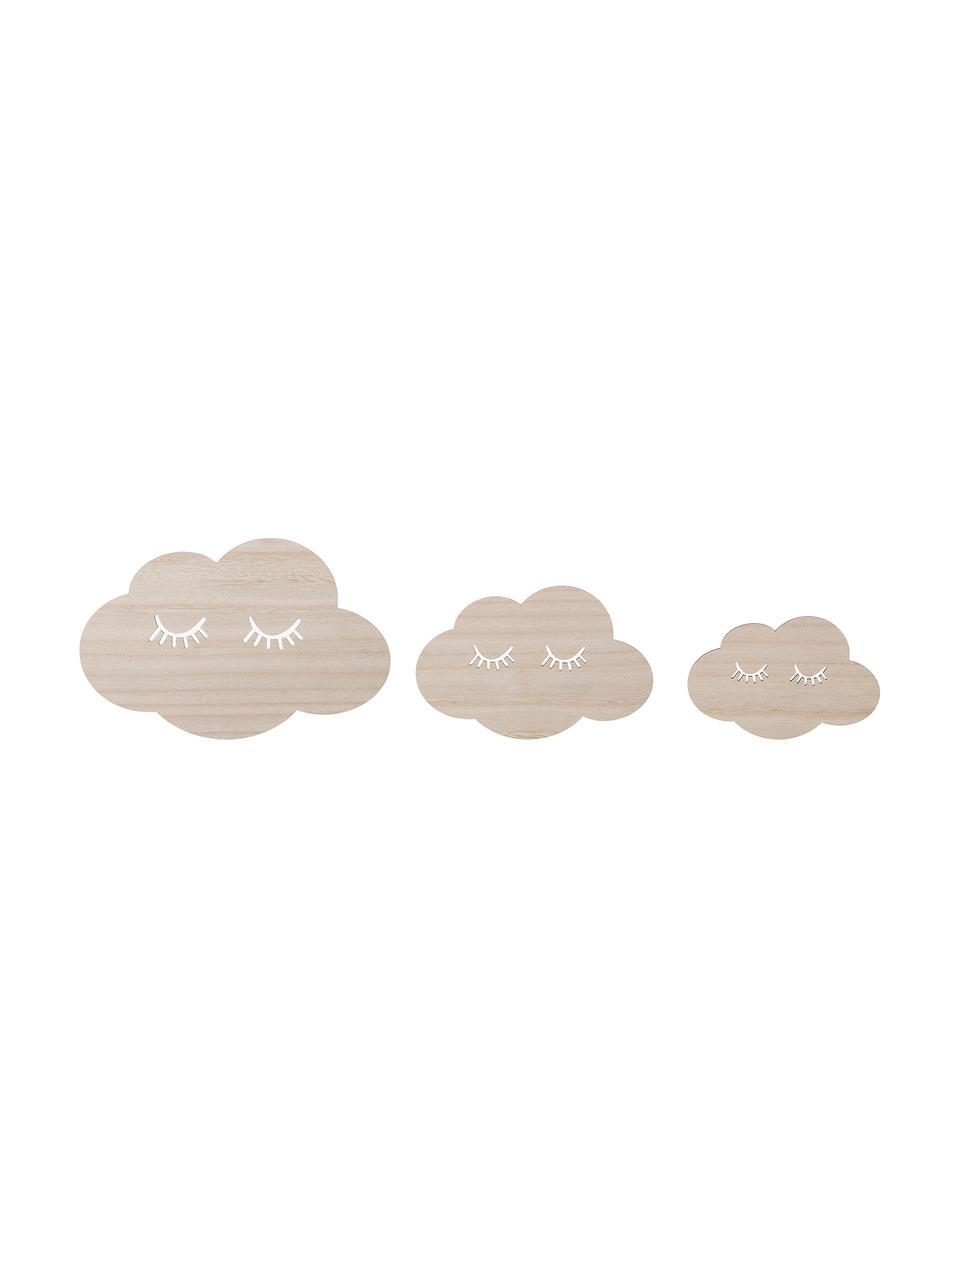 Wandobjekte-Set Clouds, 3-tlg., Sperrholz, Beige, Sondergrößen